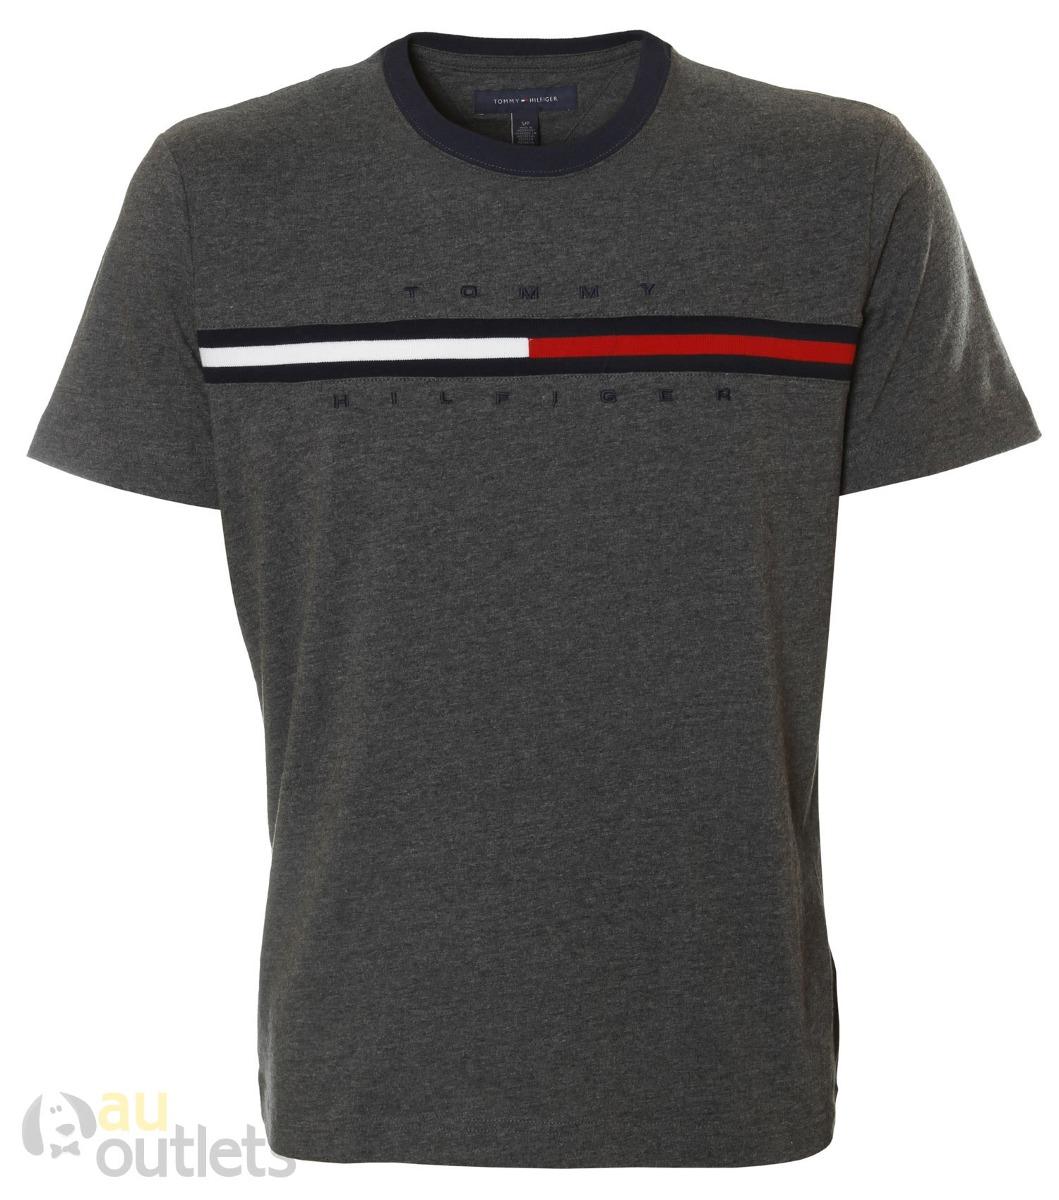 875c55b986d0e7 Camiseta Masculina Tommy Hilfiger Plumbee - R$ 220,87 em Mercado Livre